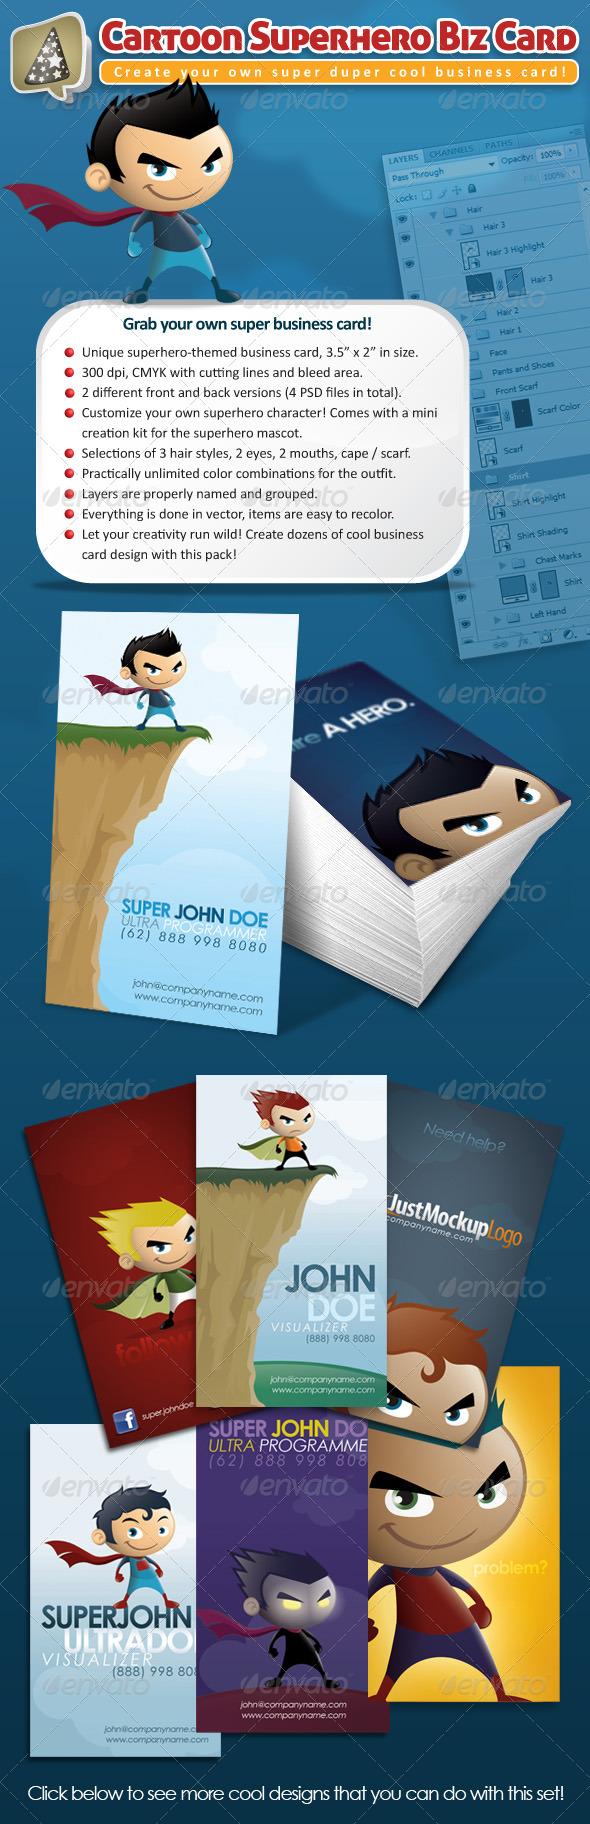 Cartoon Superhero Business Card Maker - Creative Business Cards